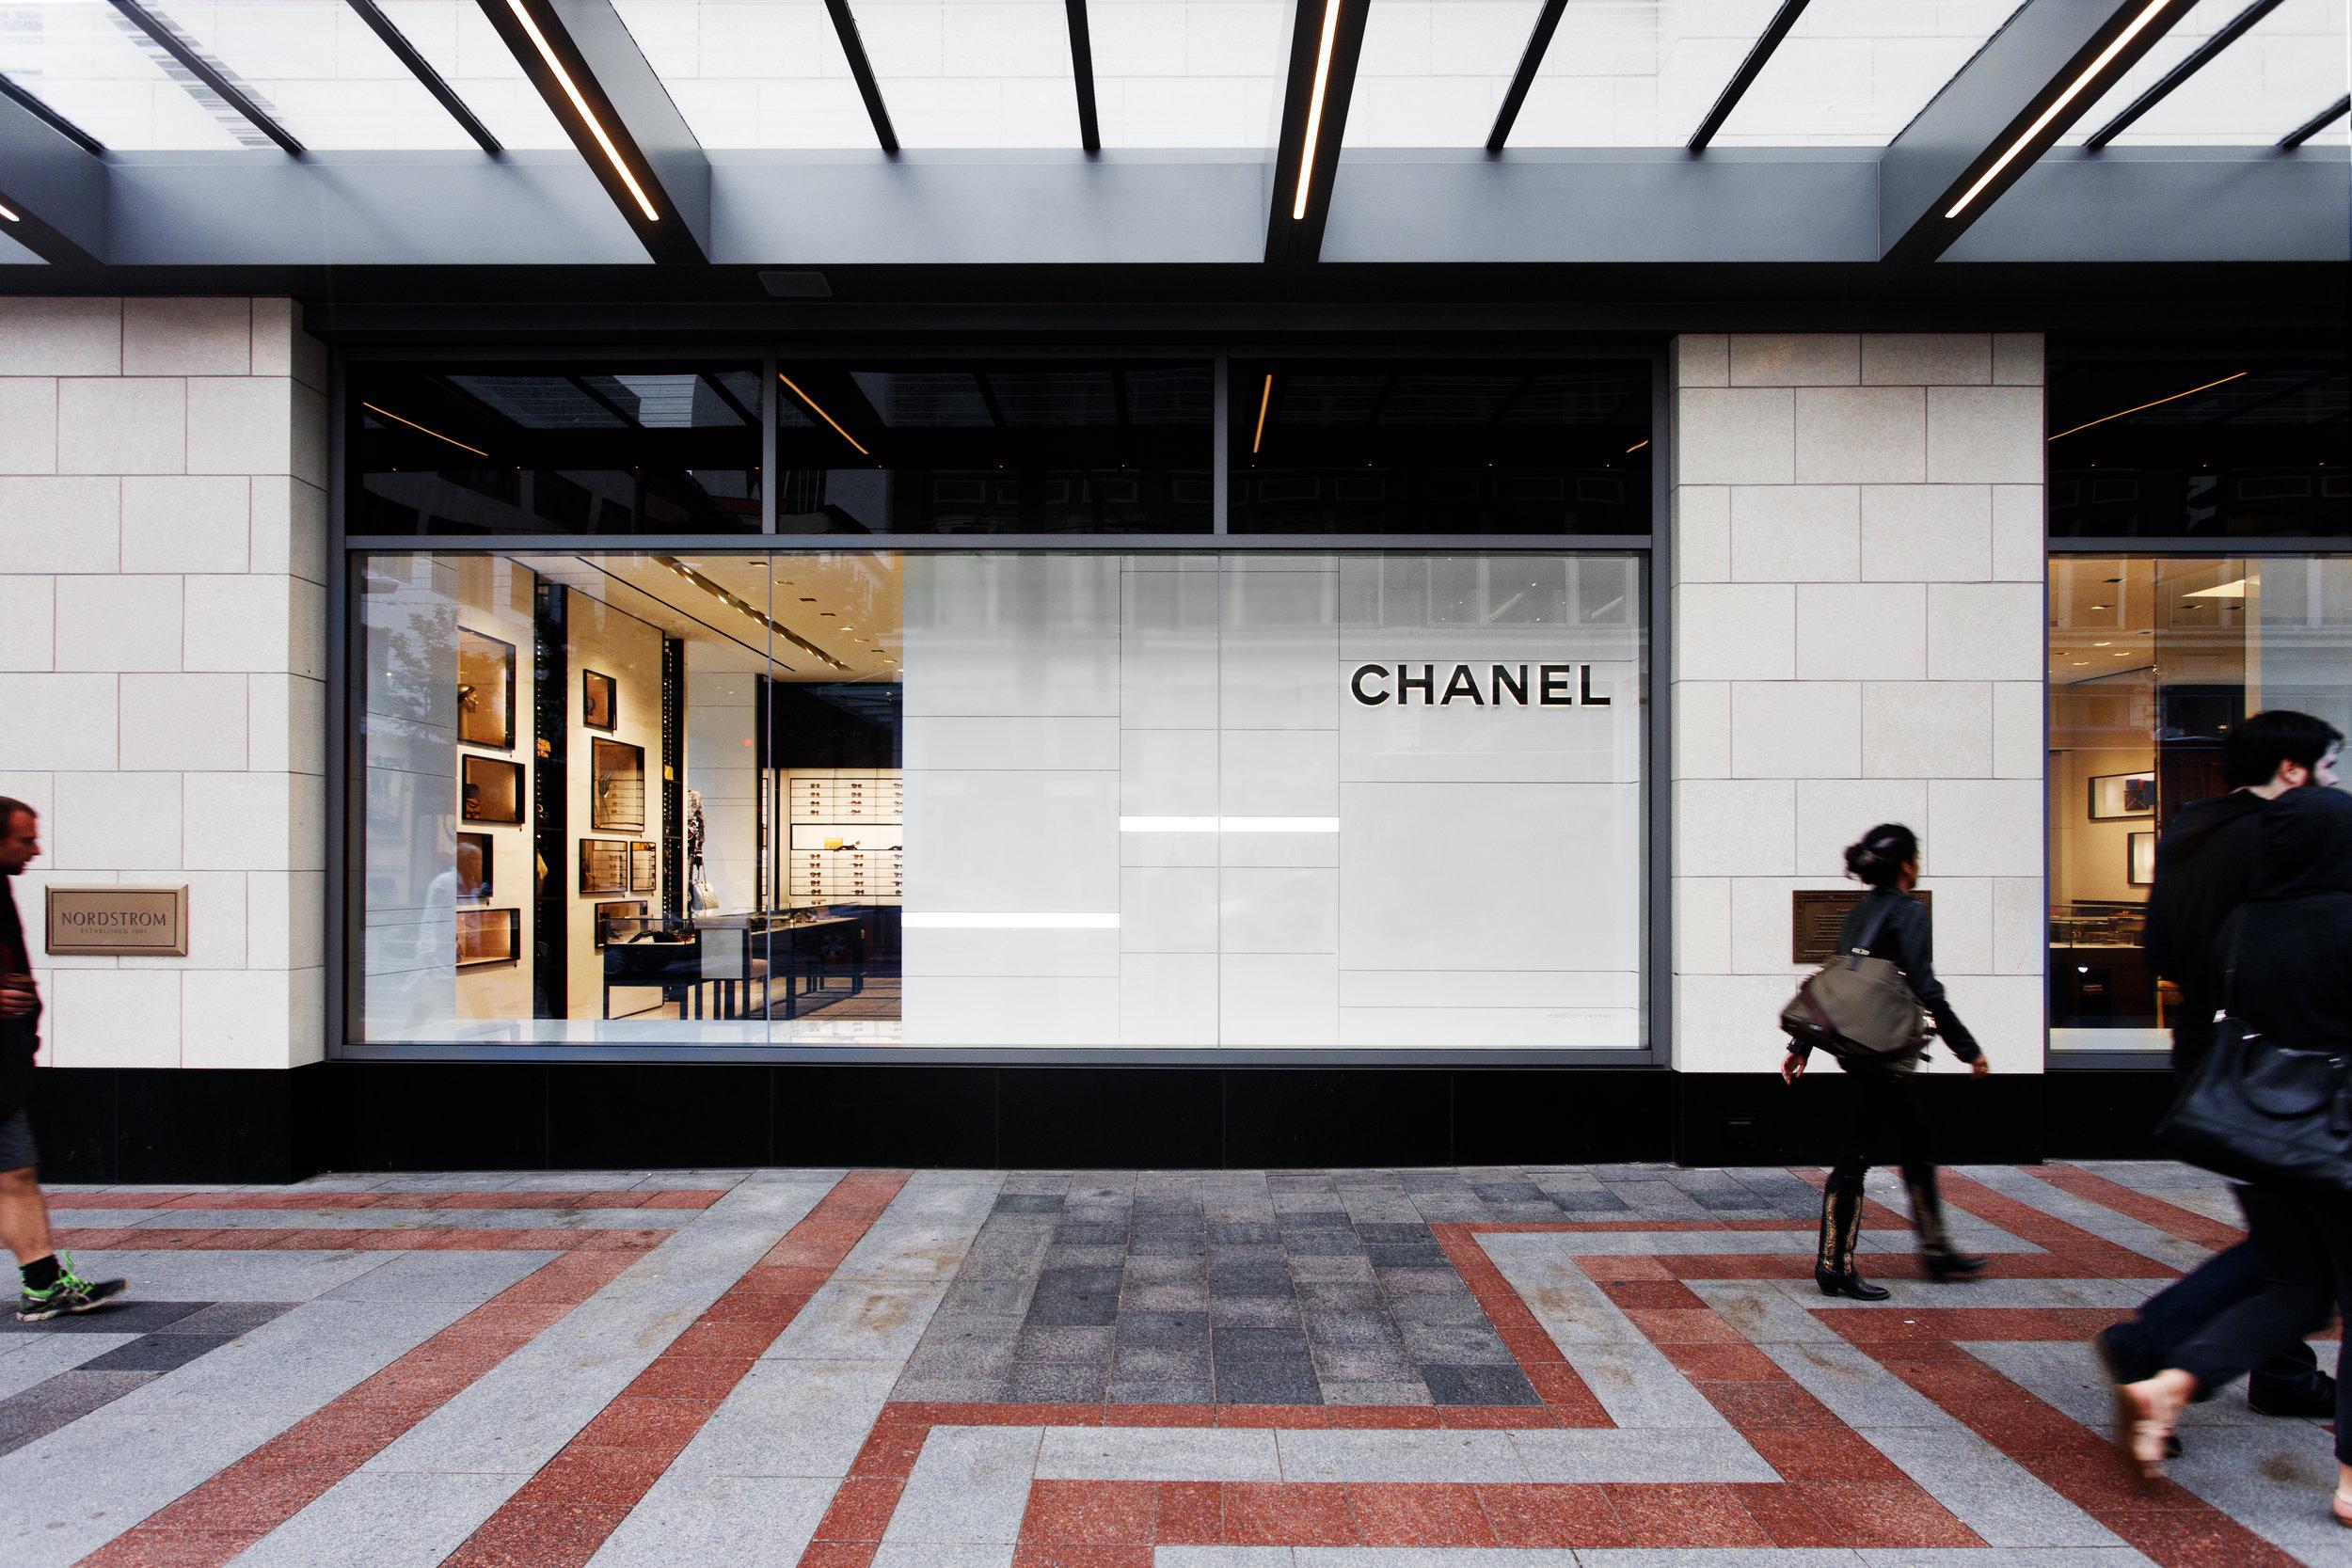 20160514 Chanel_Seattle Nordstrom_Facade_030_High-res.JPG